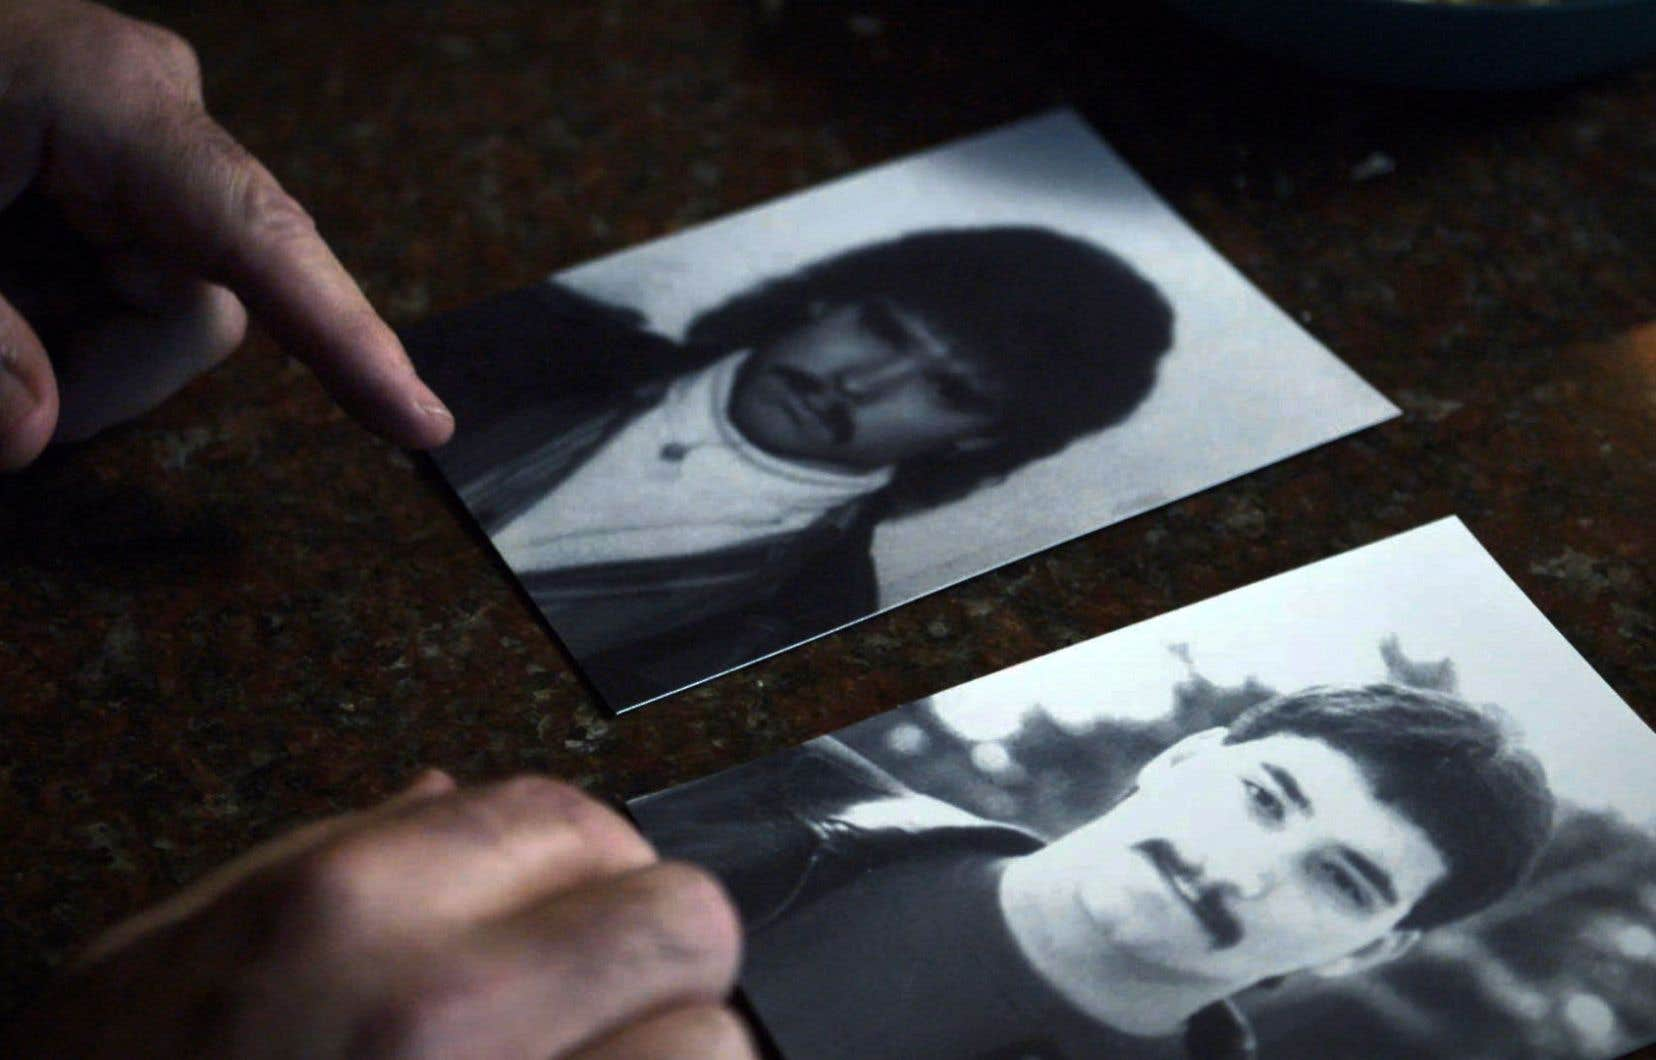 Billy Taillefer et Hughes Duguay ont été faussement accusés du meurtre de Sandra Gaudet.